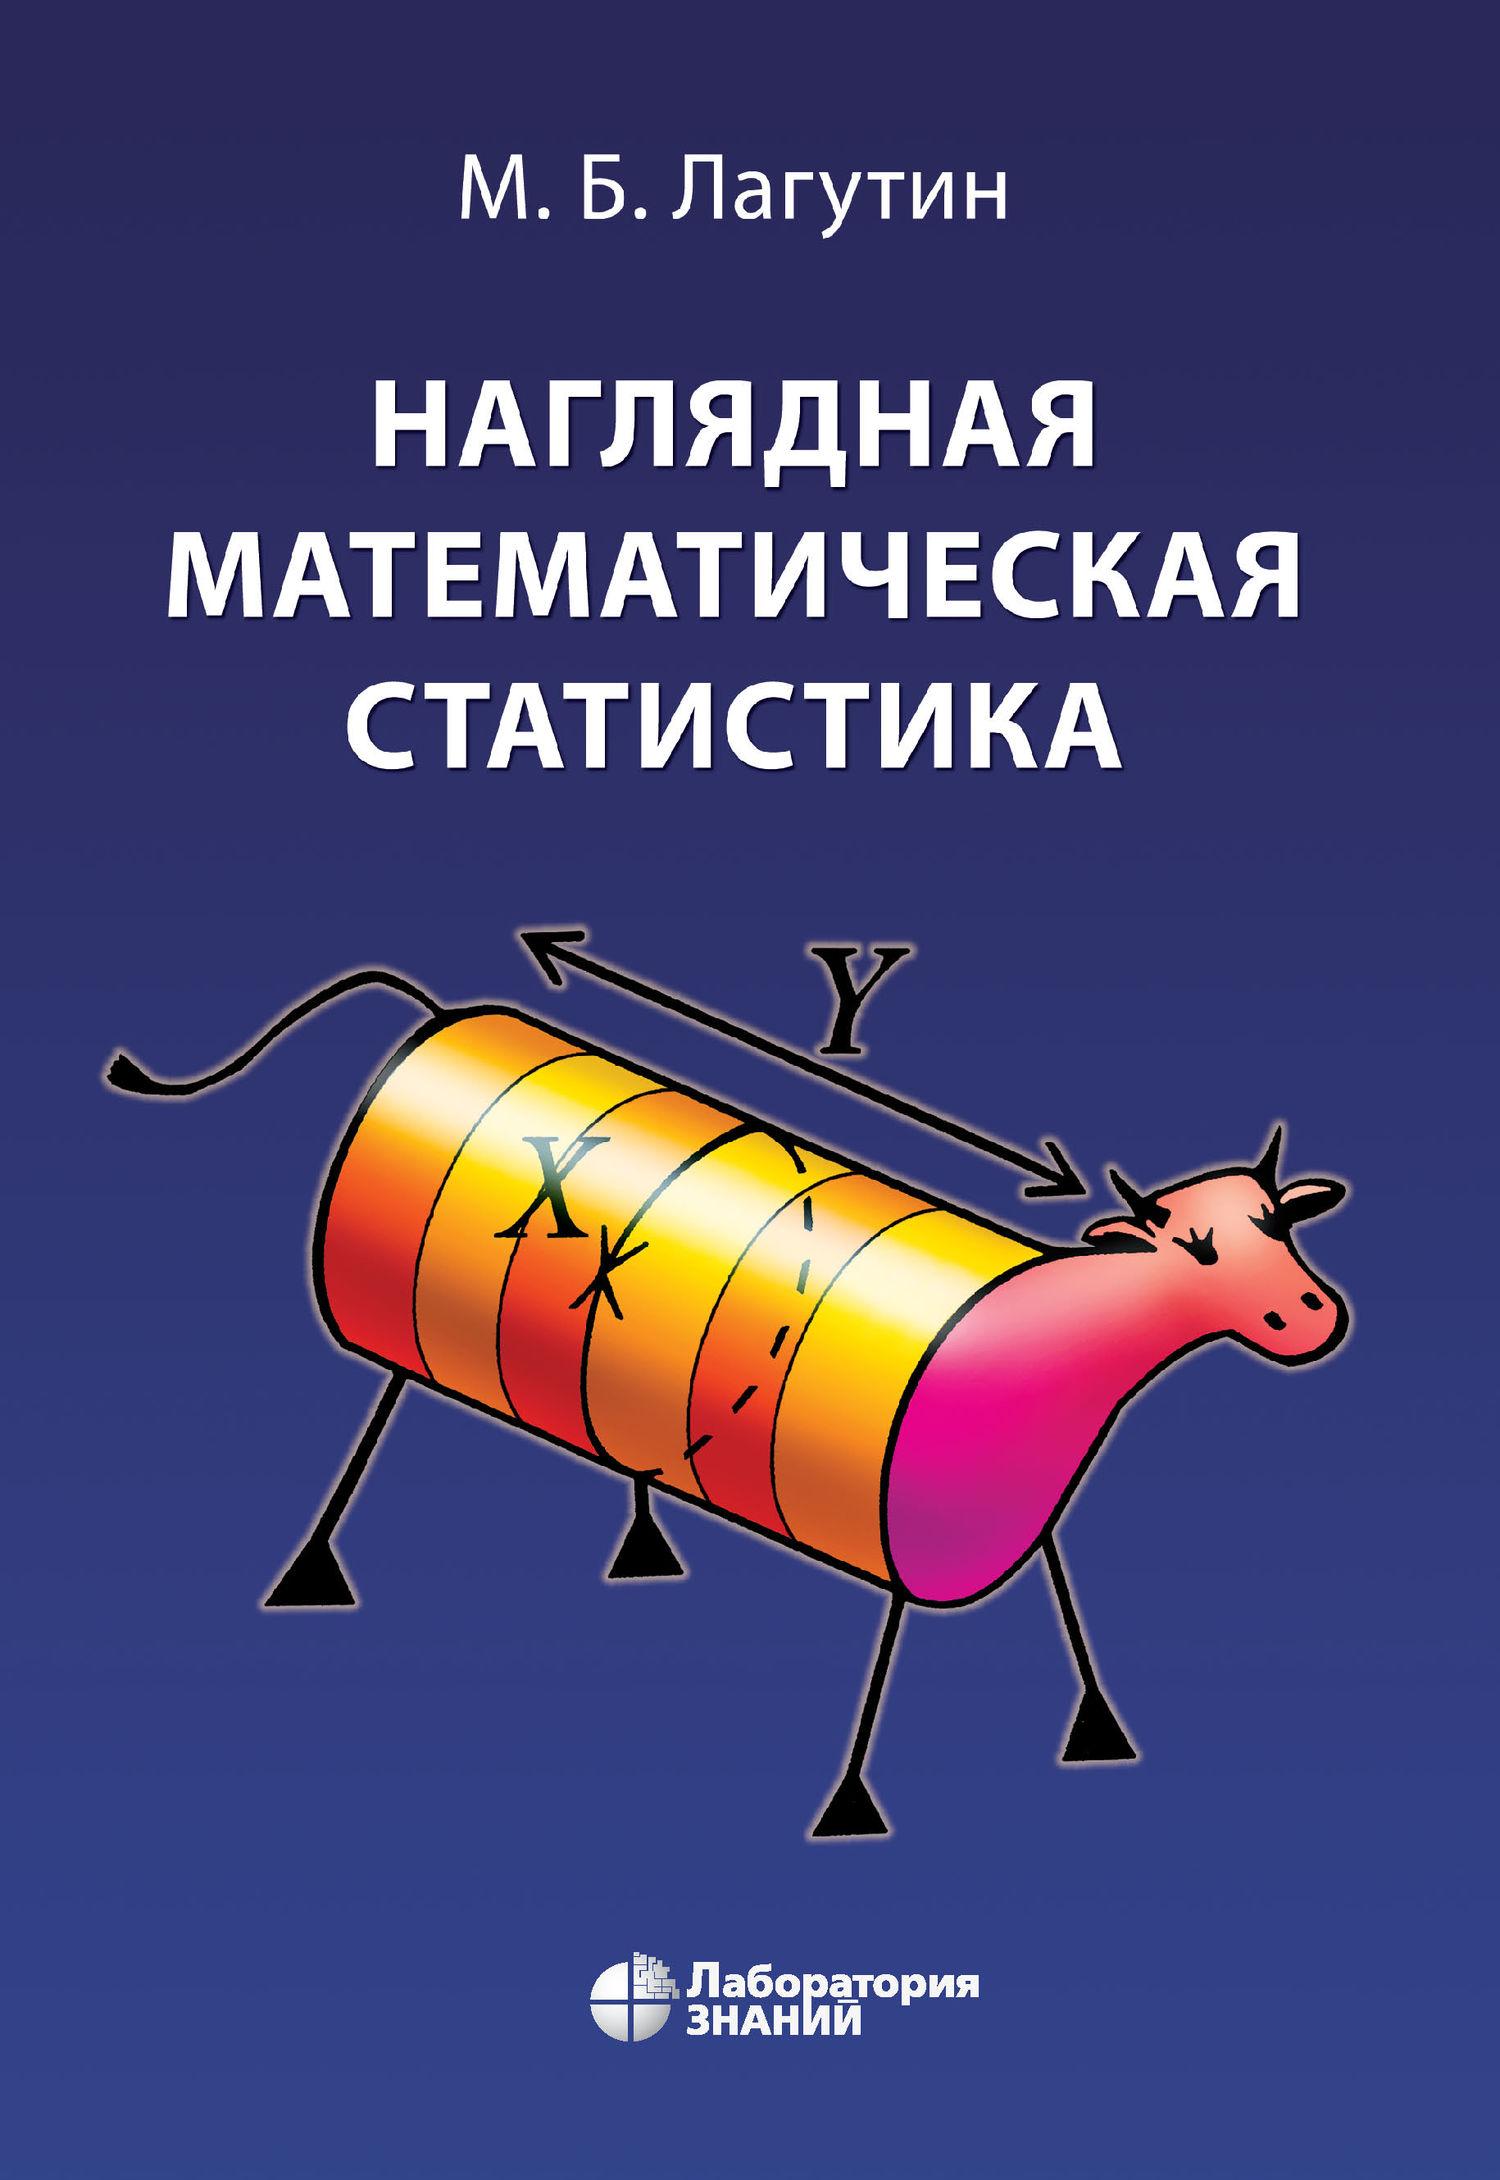 М. Б. Лагутин Наглядная математическая статистика